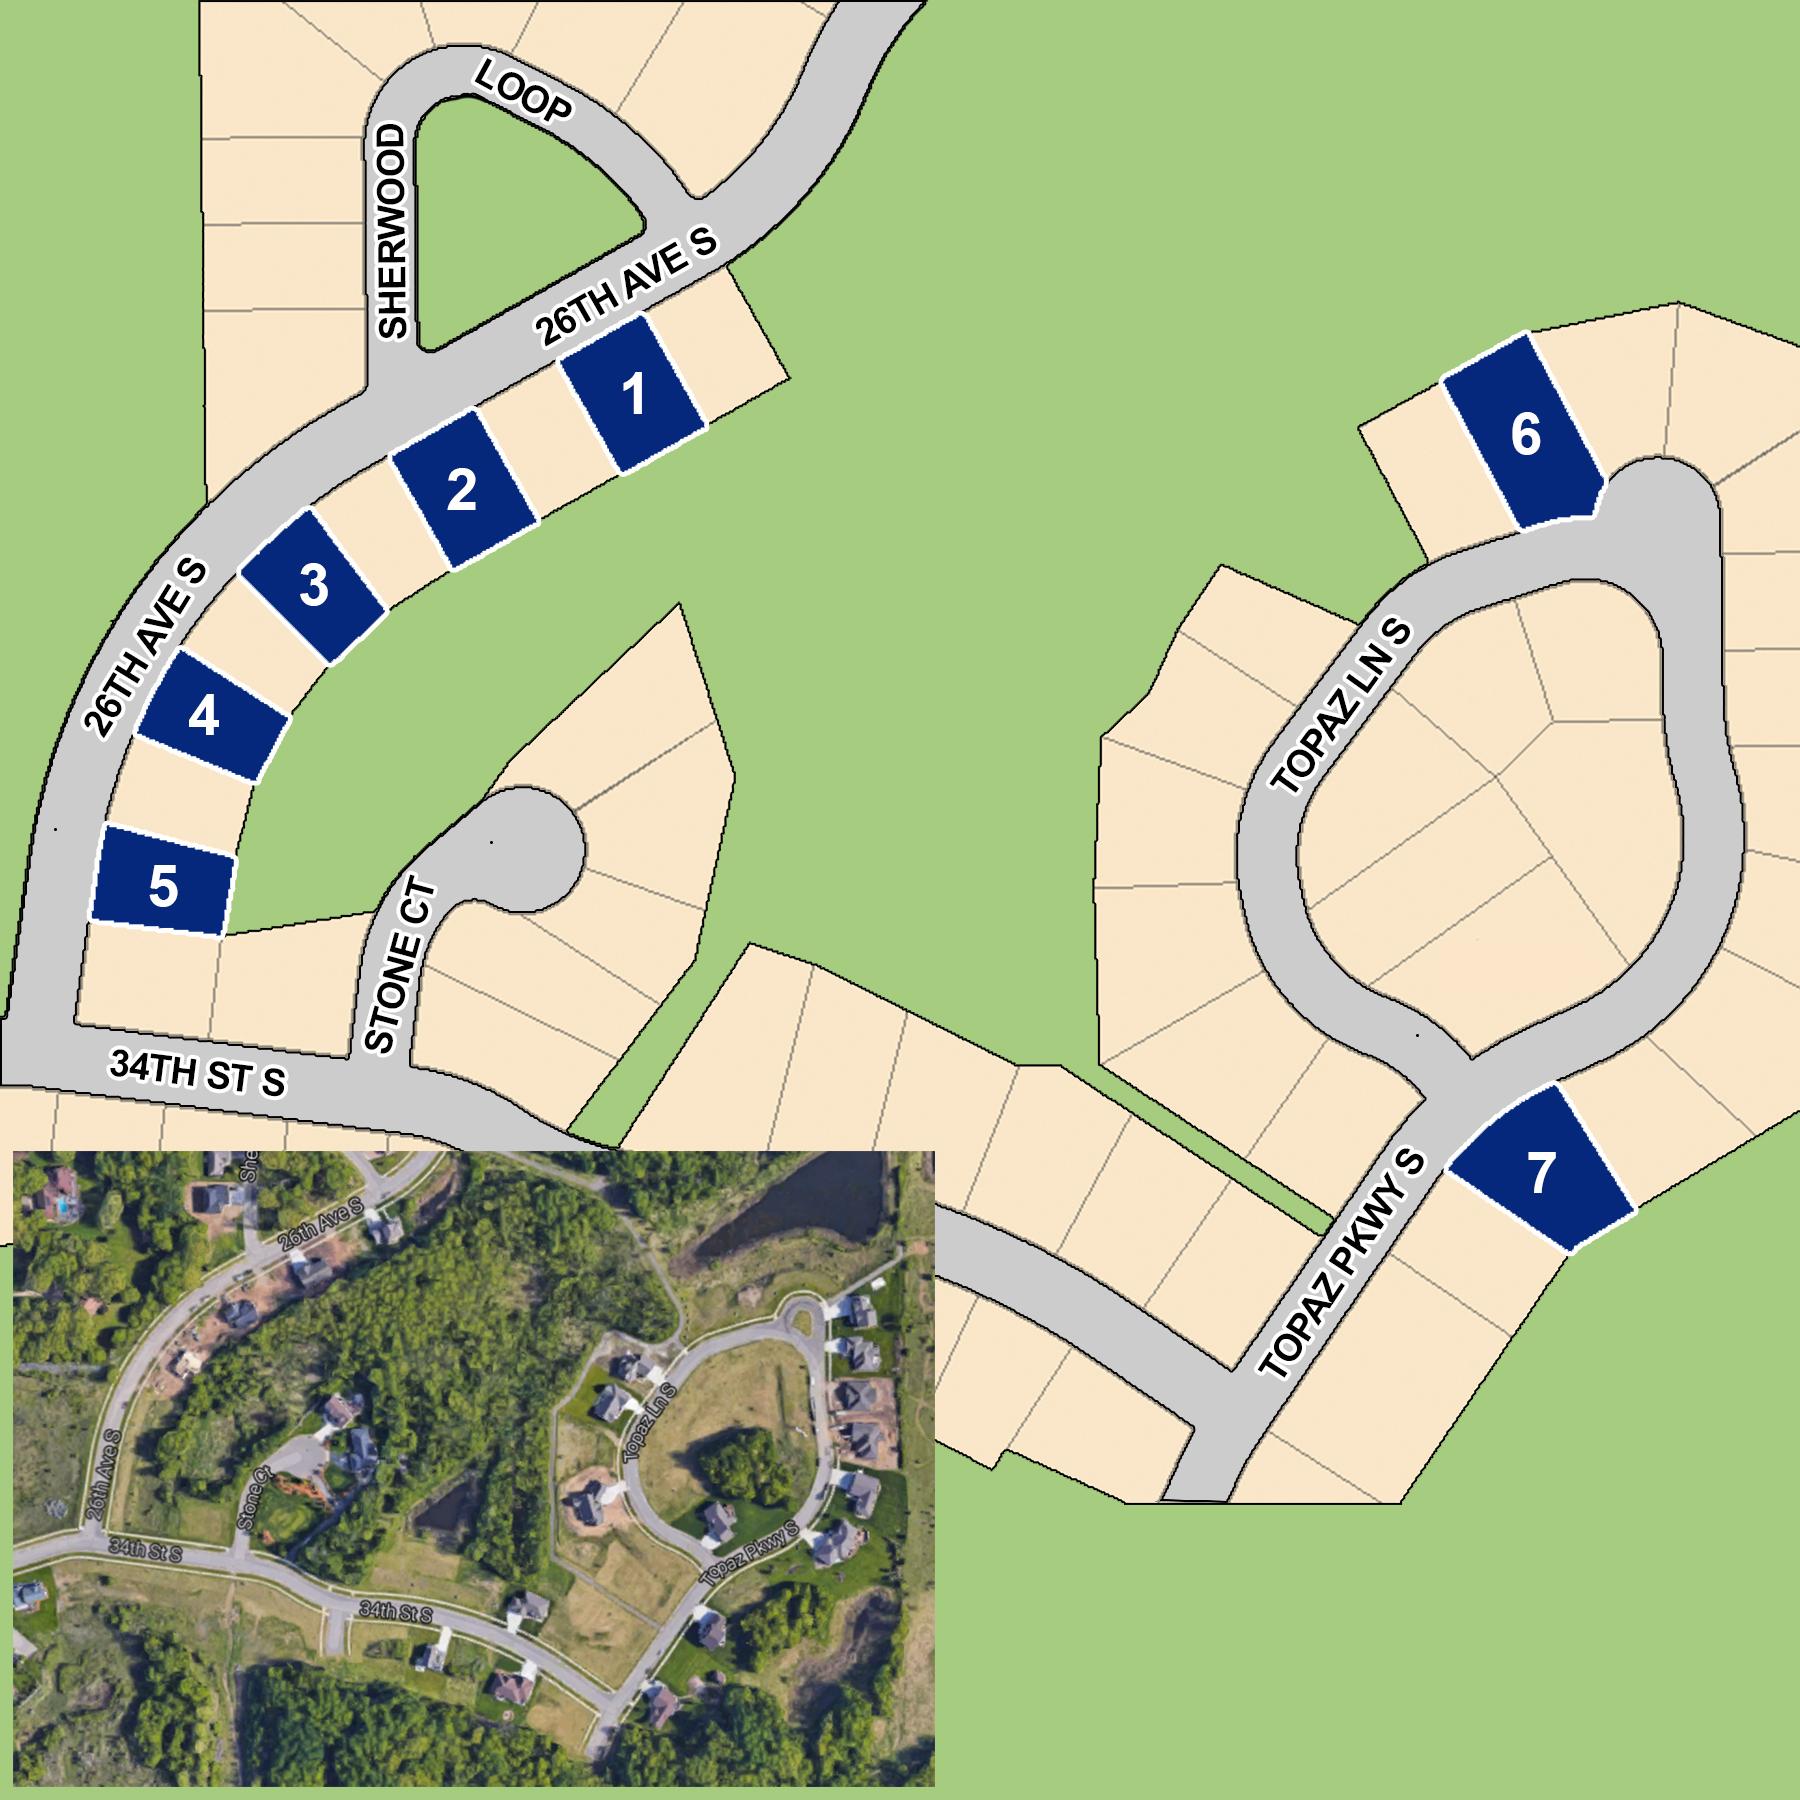 Quarry Woods - Lot 1:$49,9003324 26th Ave. S, St. Cloud 56301Lot 2:$49,9003332 26th Ave. S, St. Cloud 56301Lot 3:$44,9003340 26th Ave. S, St. Cloud 56301Lot 4:$44,9003348 26th Ave. S, St. Cloud 56301Lot 5:$44,9003356 26th Ave. S, St. Cloud 56301Lot 6:$69,9003311 Topaz Lane, St. Cloud 56301Lot 7:$79,9003354 Topaz Lane, St. Cloud 56031